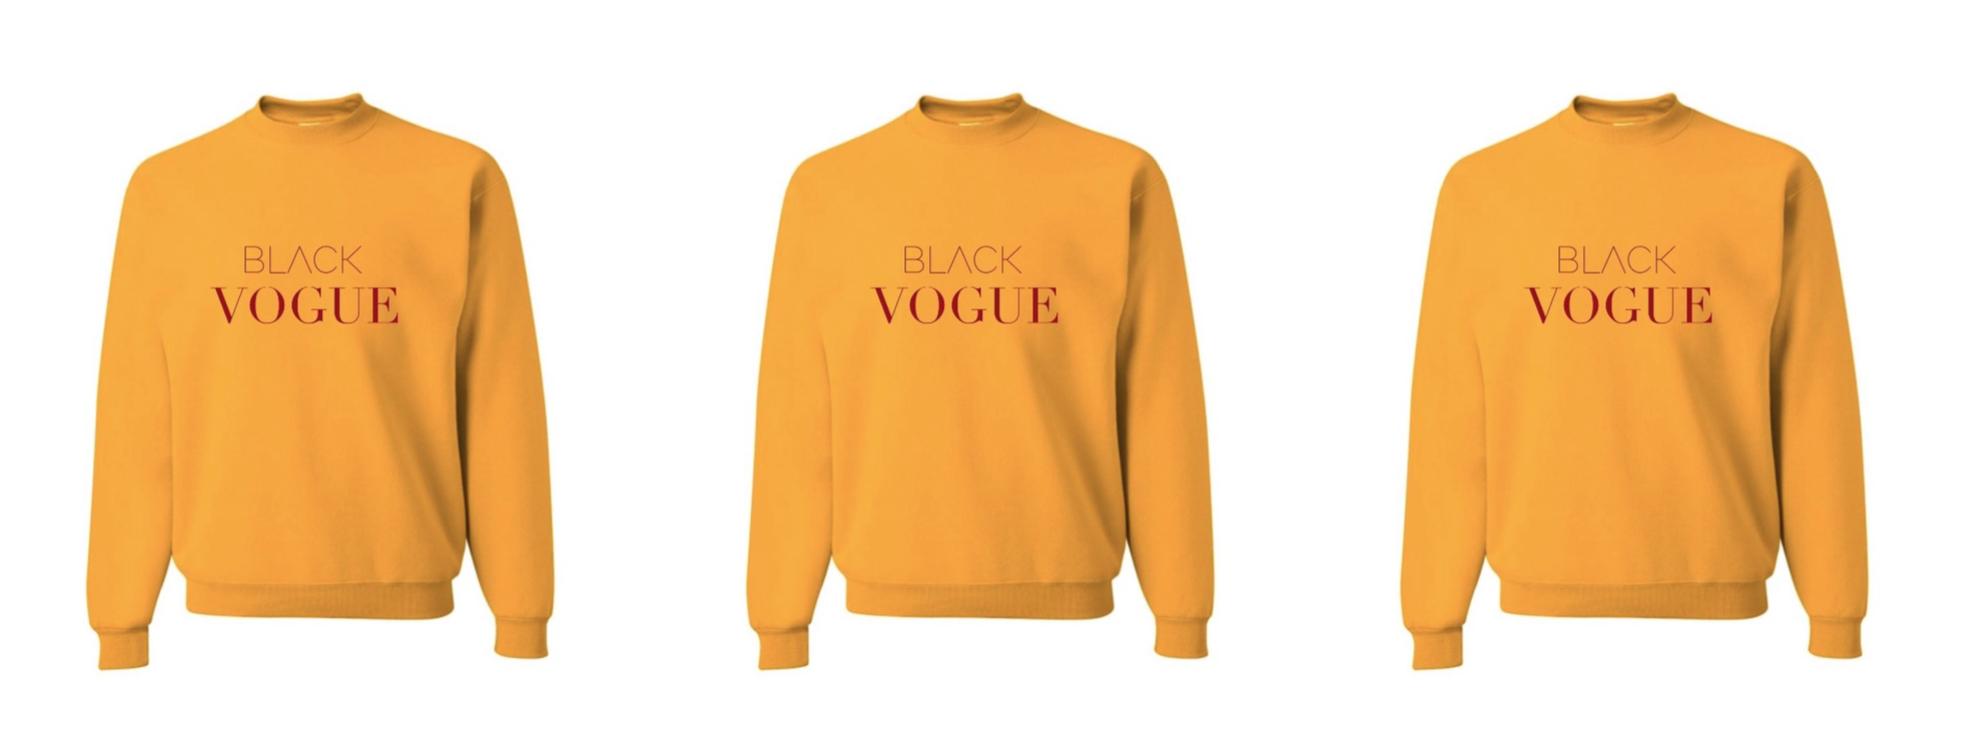 Willis' sweatshirts